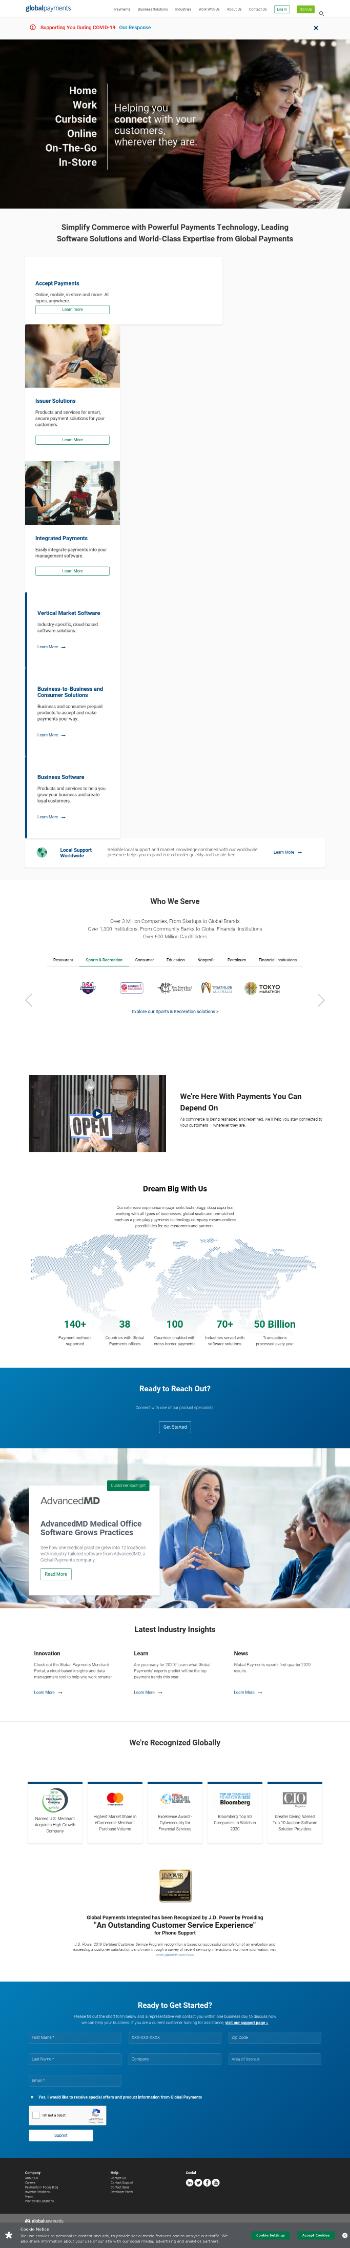 Global Payments Inc. Website Screenshot